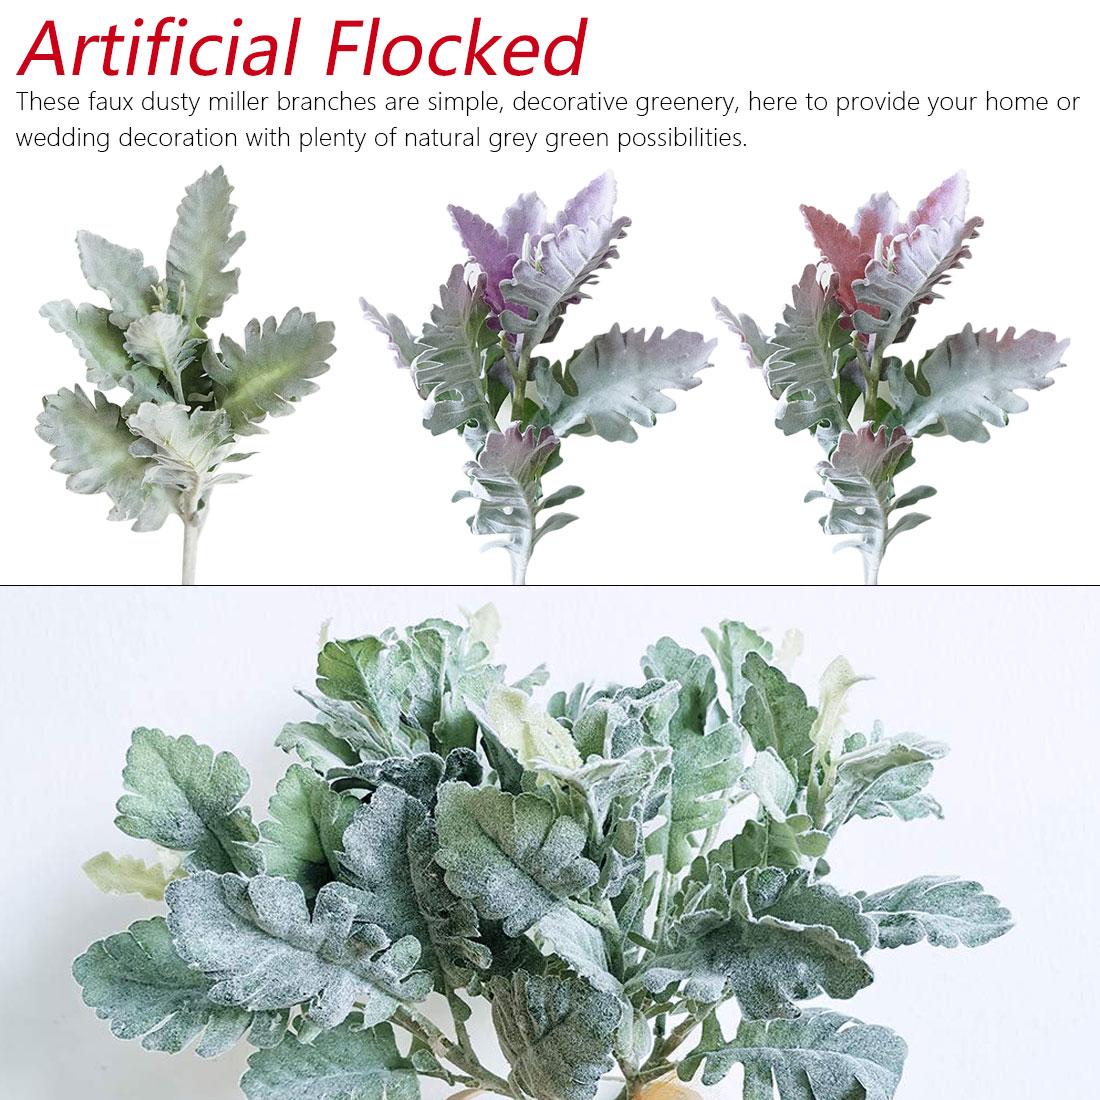 Flocked Artificial Miller Plants Purple Leaves Home Wedding Christmas DIY Decoration Fake Flowers Arrangement Faux Foliage